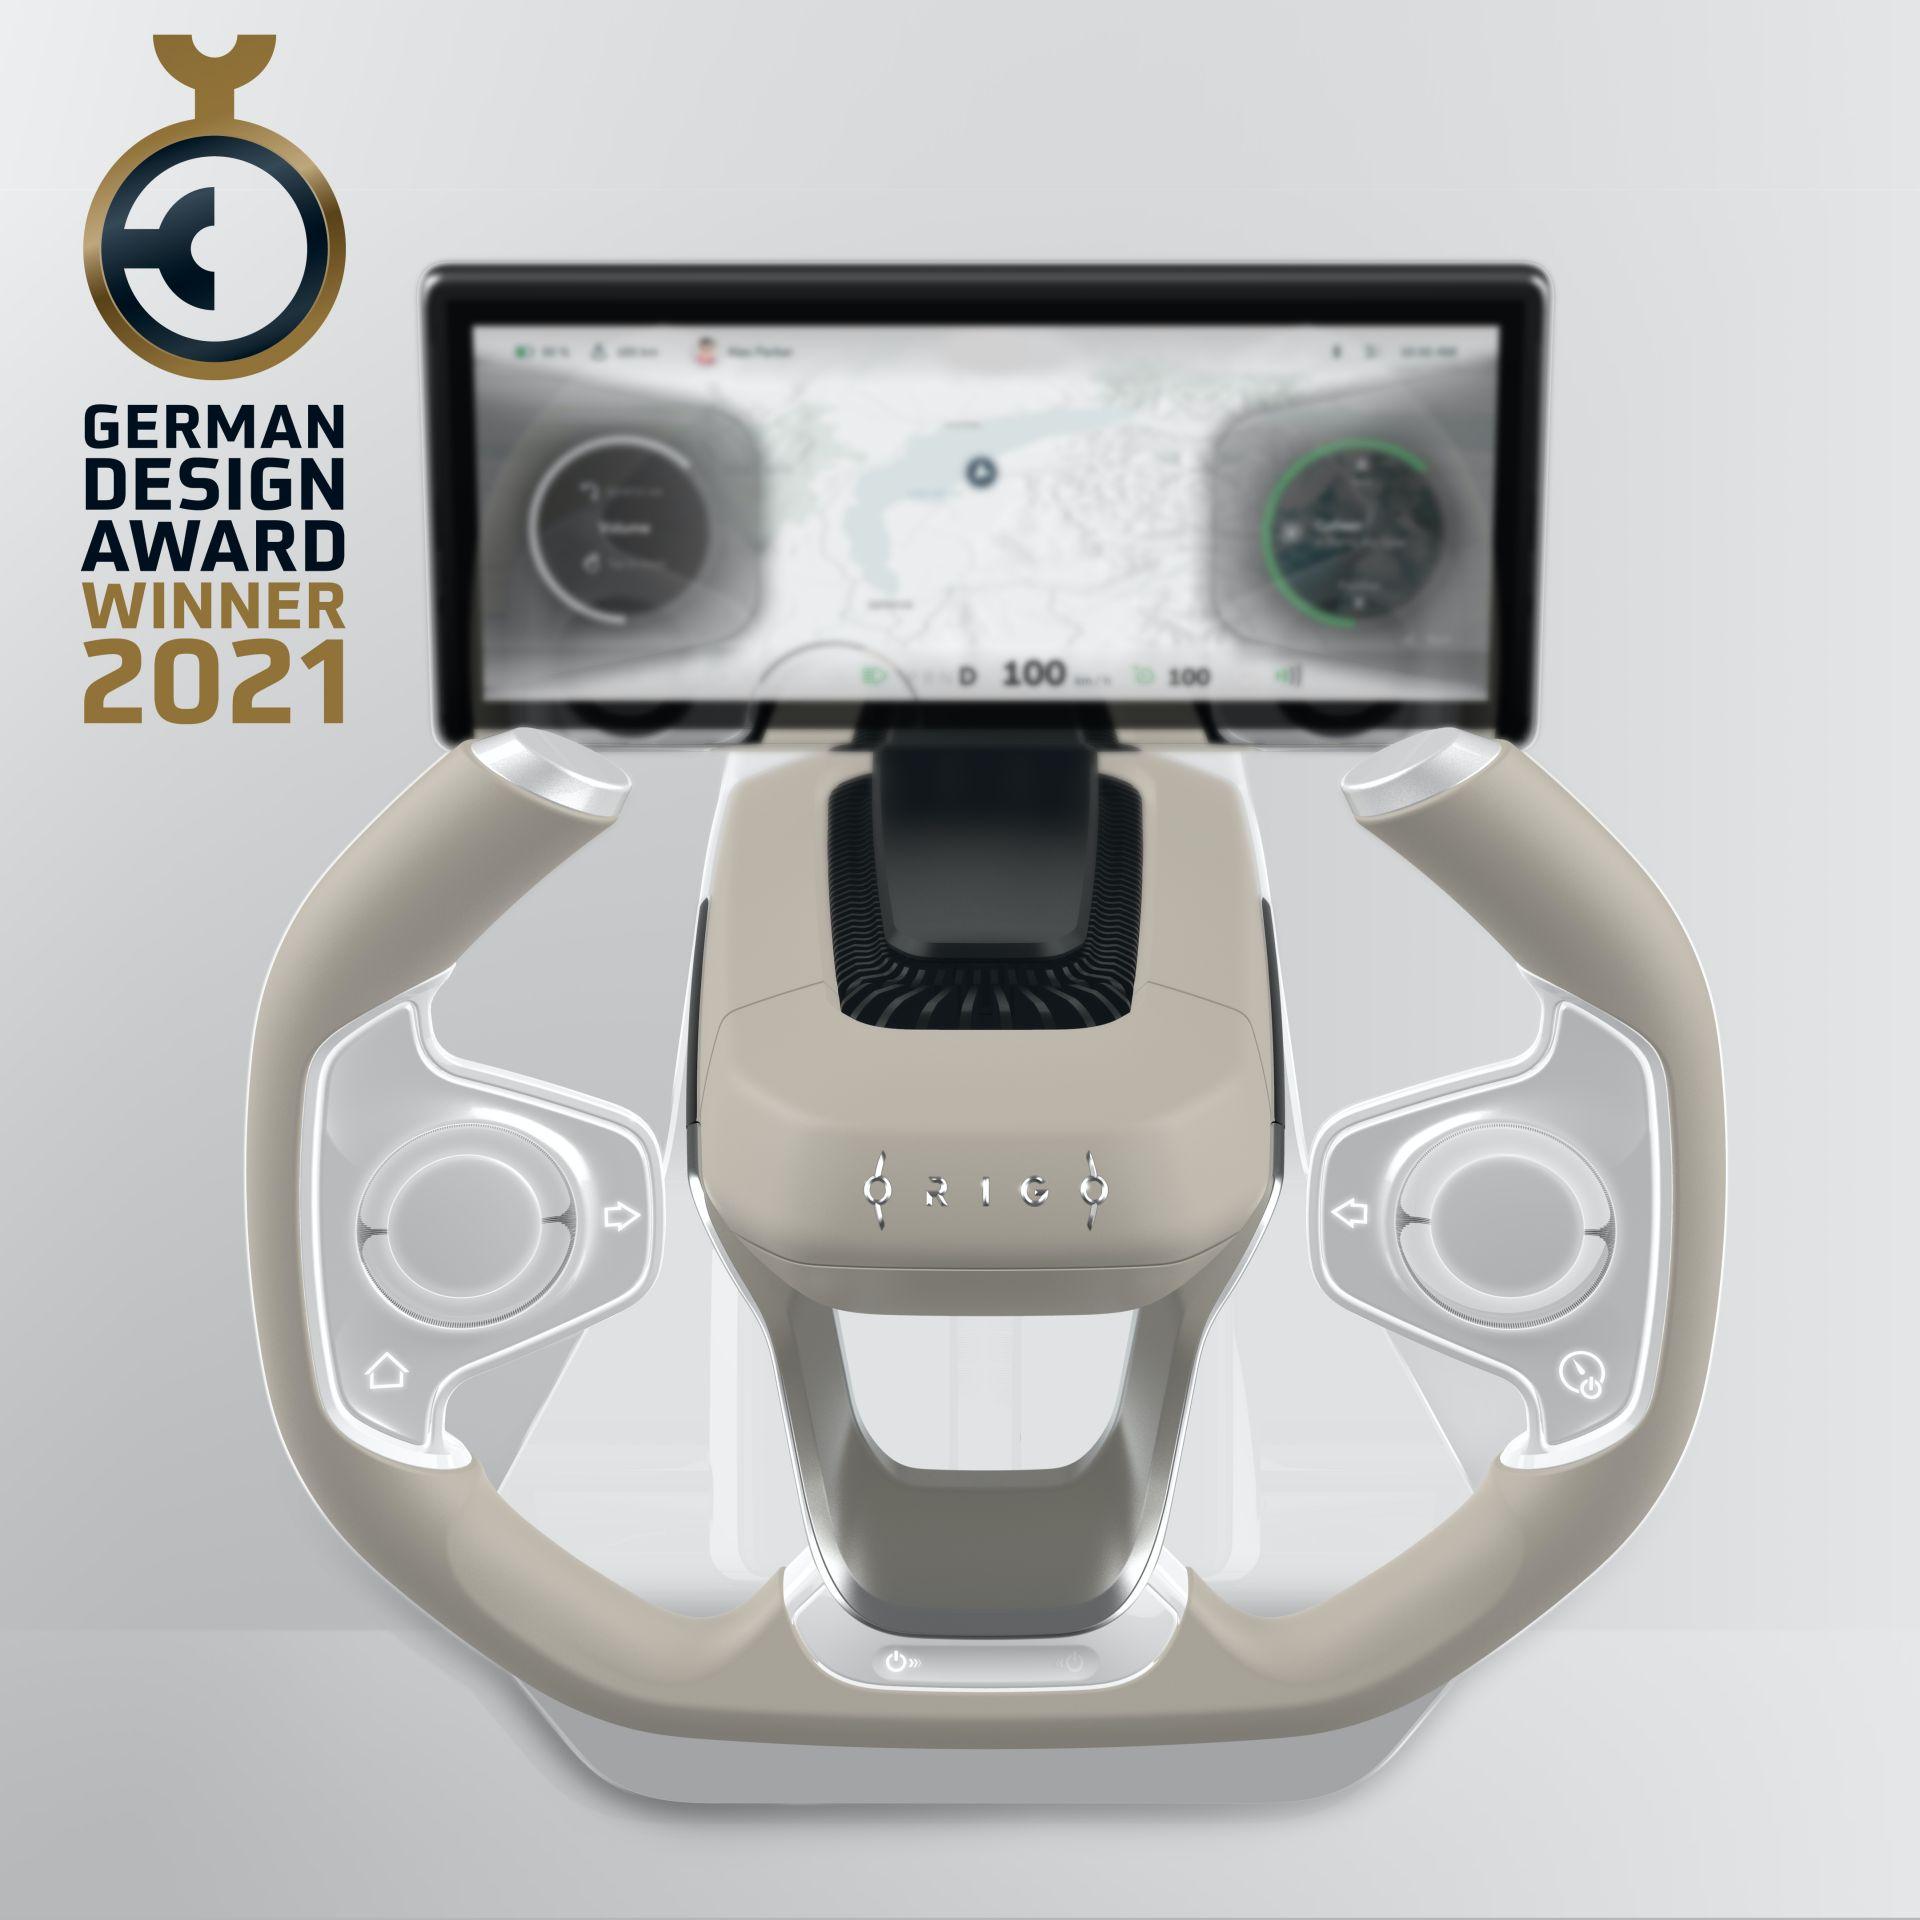 Origo-Steering-Wheel-Concept-4